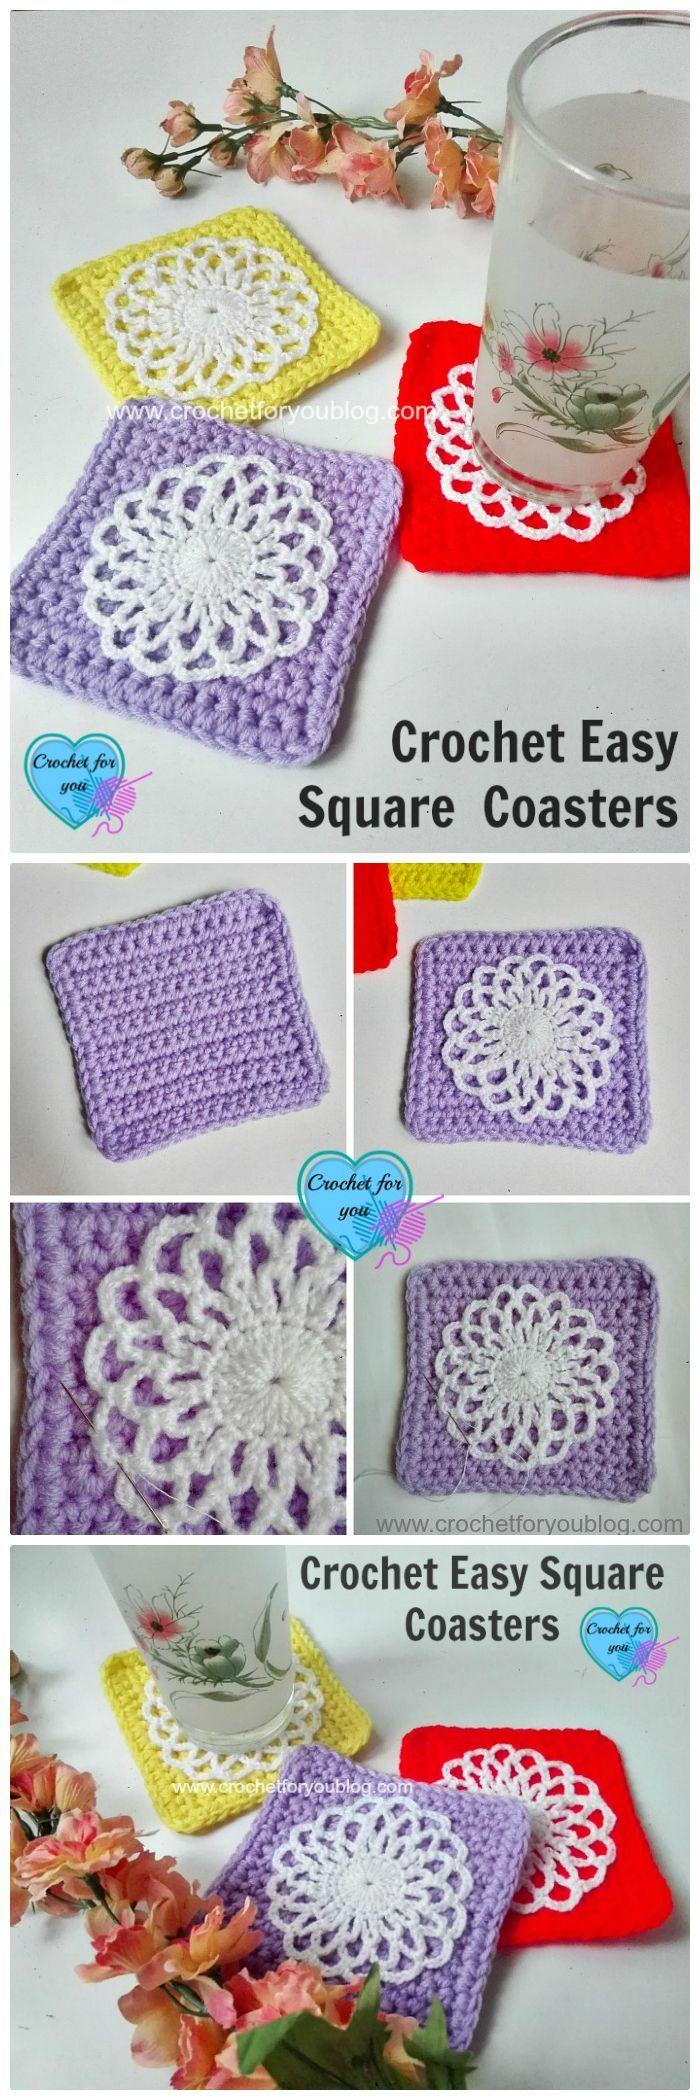 757 best Crochet Cup Cozy images on Pinterest | Stricken häkeln ...